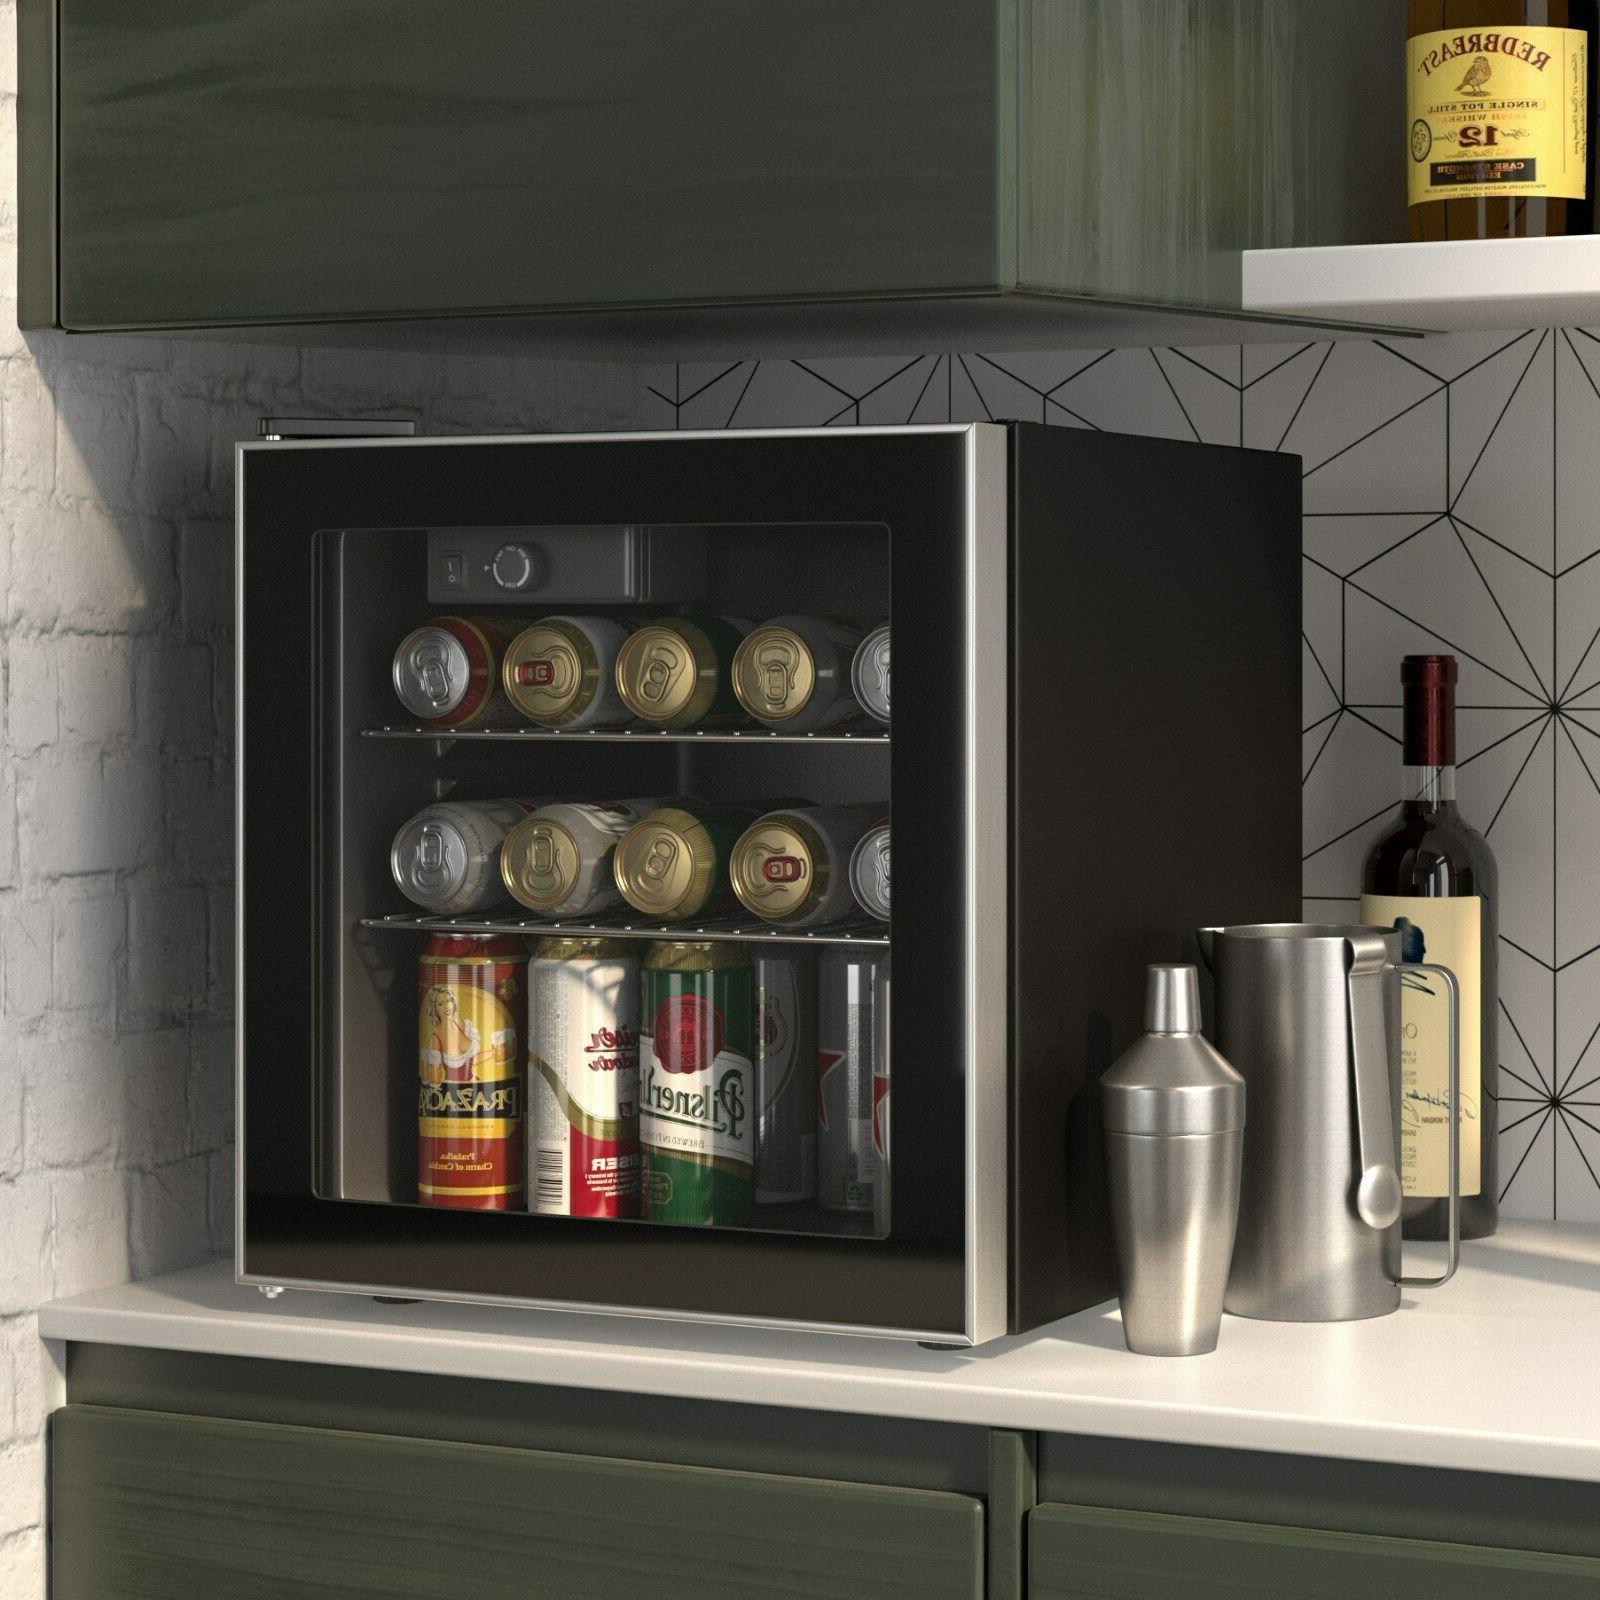 60 can beverage mini refrigerator wine cooler